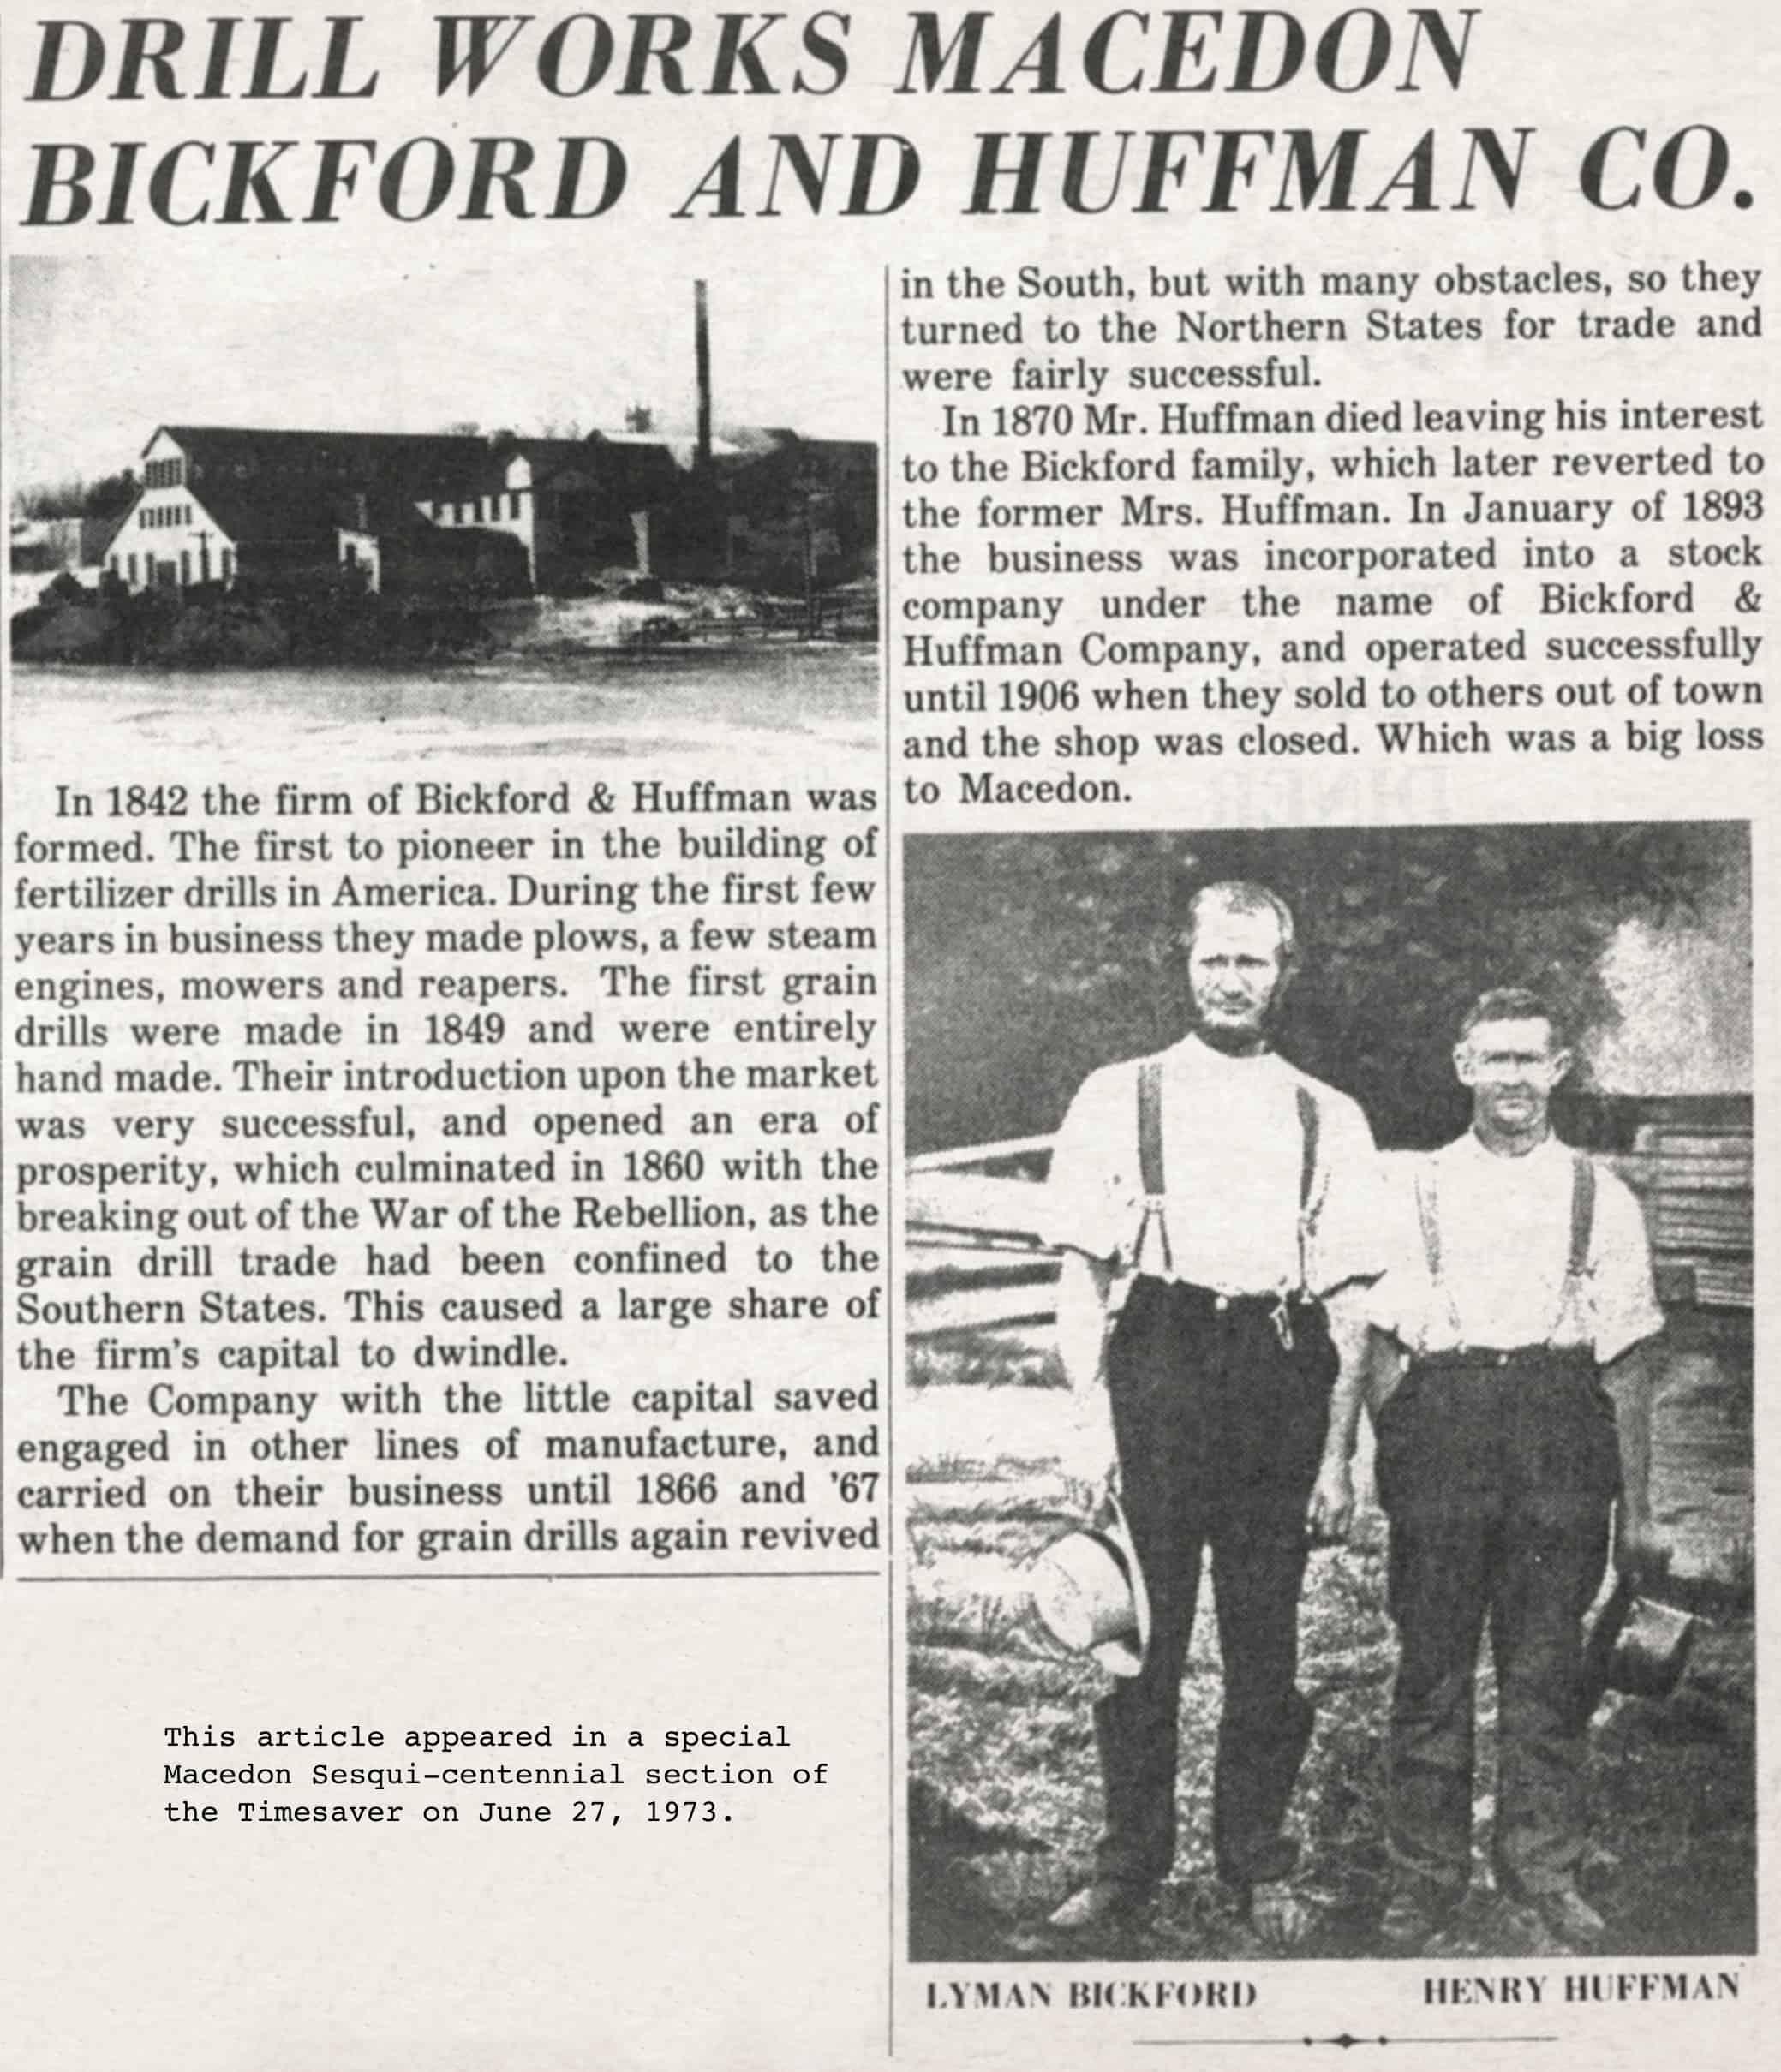 bickford_huffman_short_history